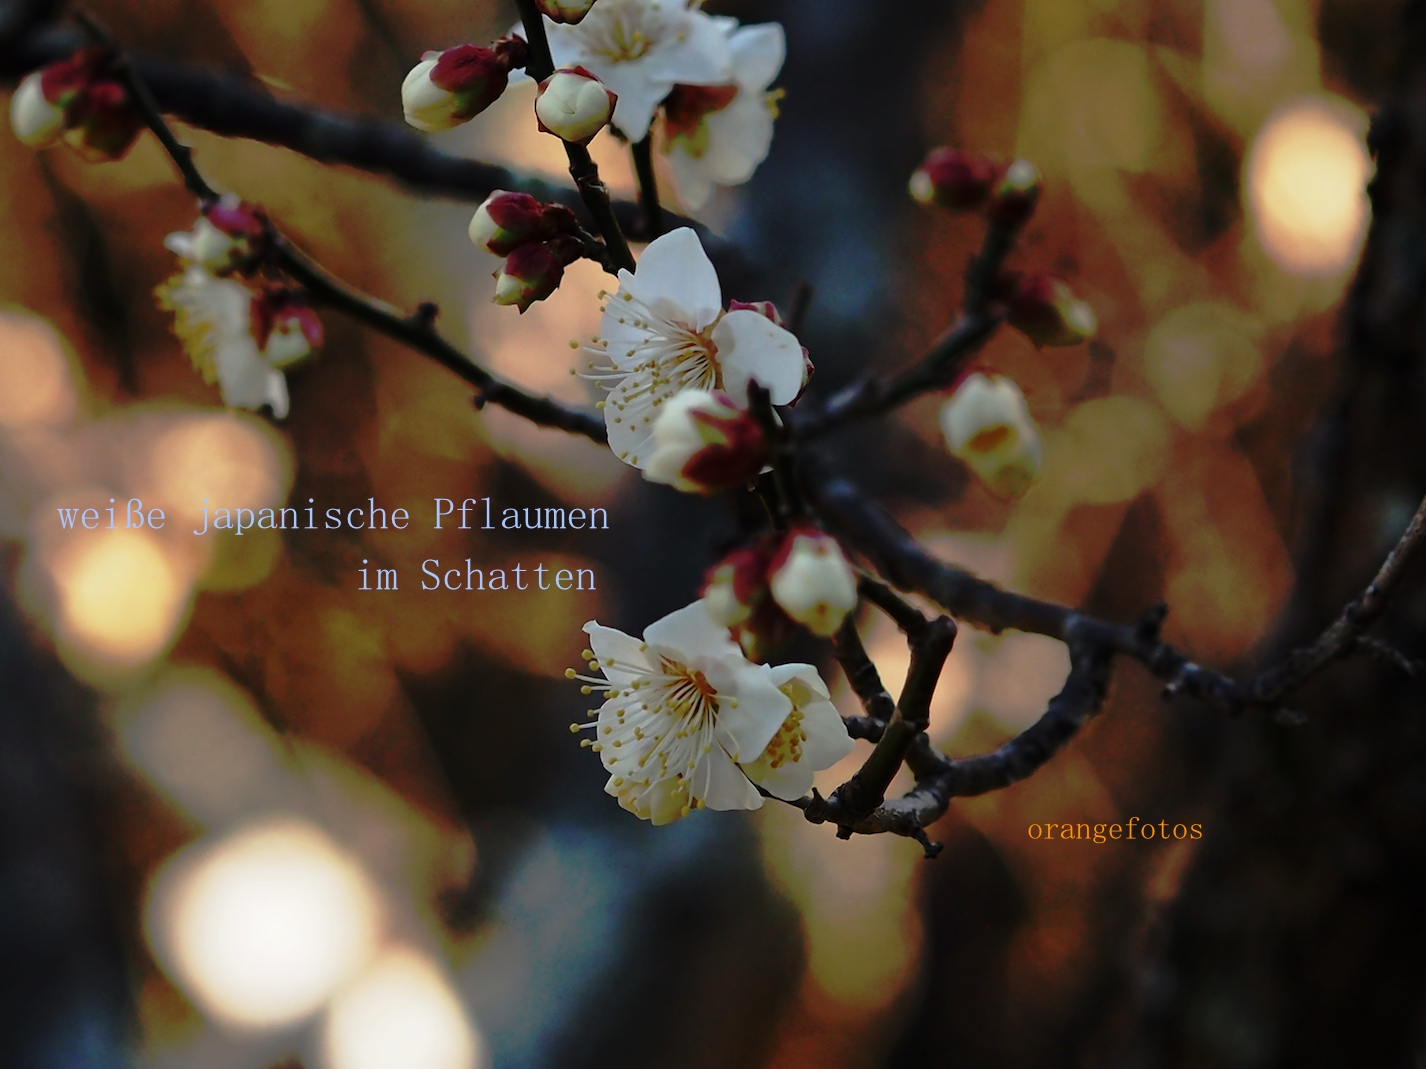 Pflaumenblühten 04.02.17.b.jpg